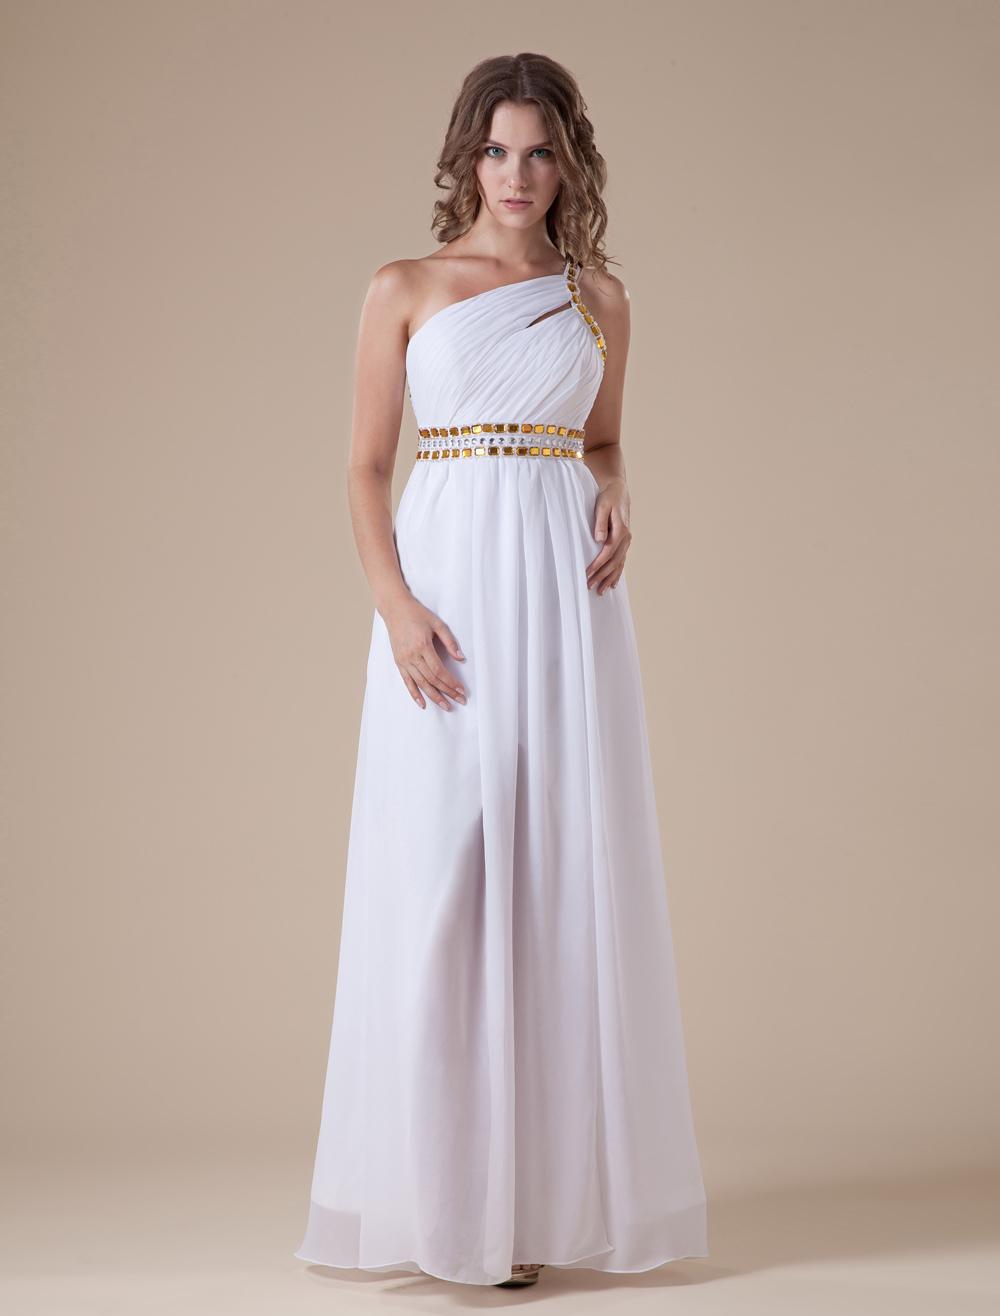 White Chiffon Satin One Shoulder Evening Dress With Front Slit (Wedding Evening Dresses) photo